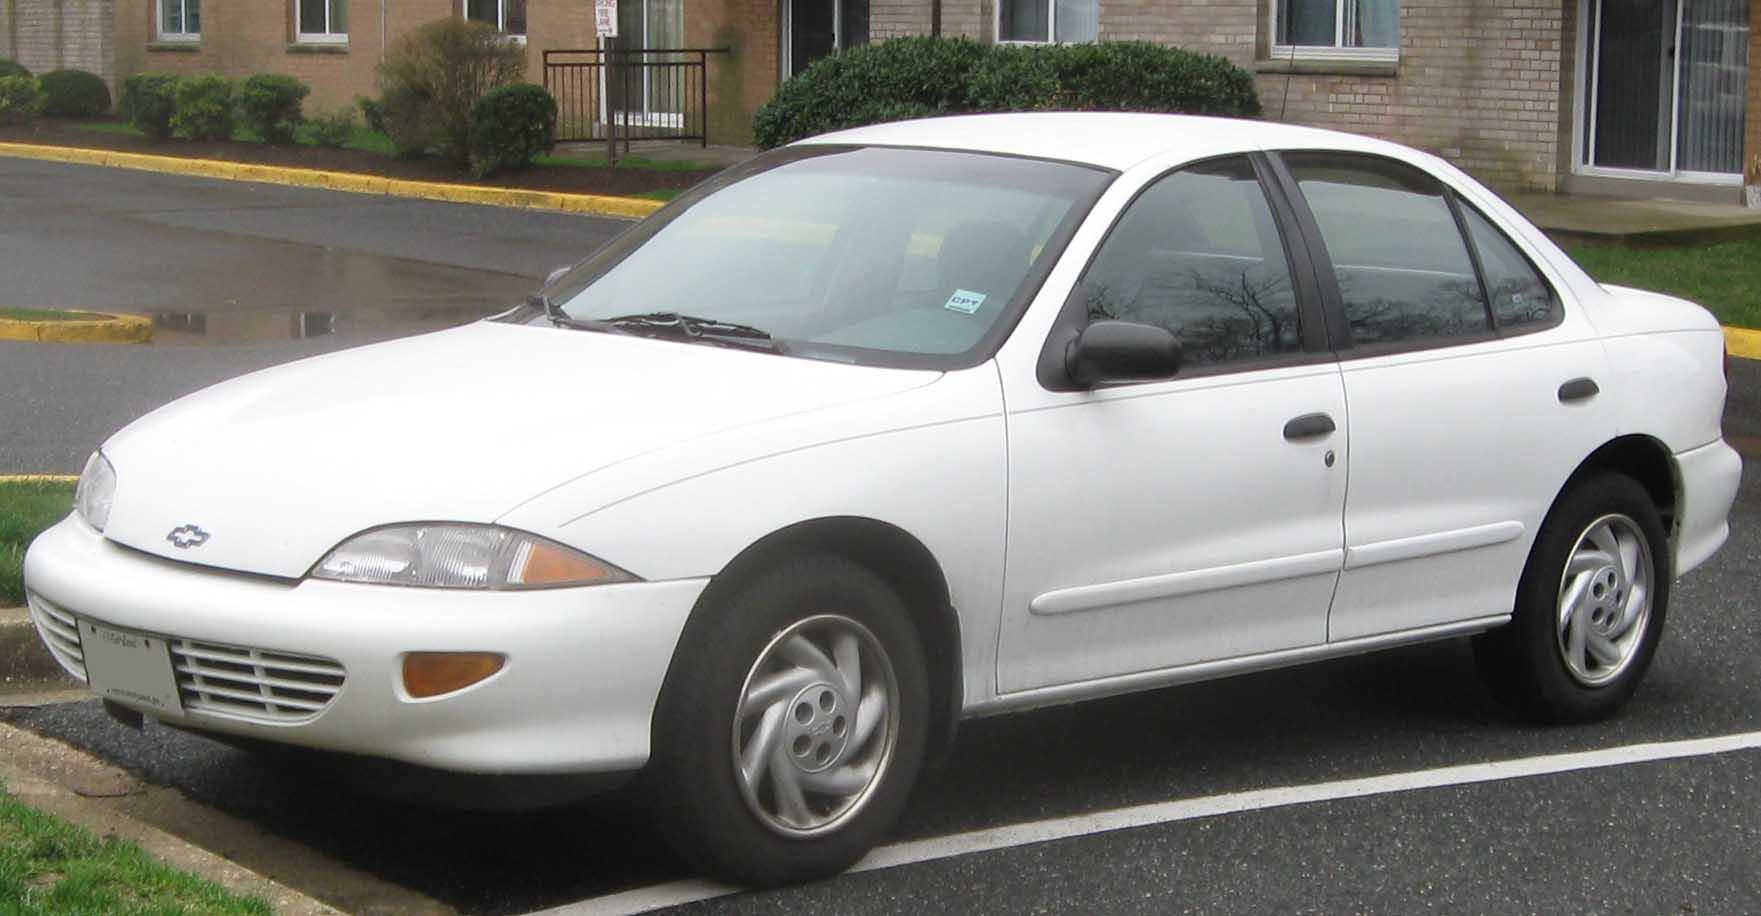 Chevrolet Cavalier 2010 foto - 1